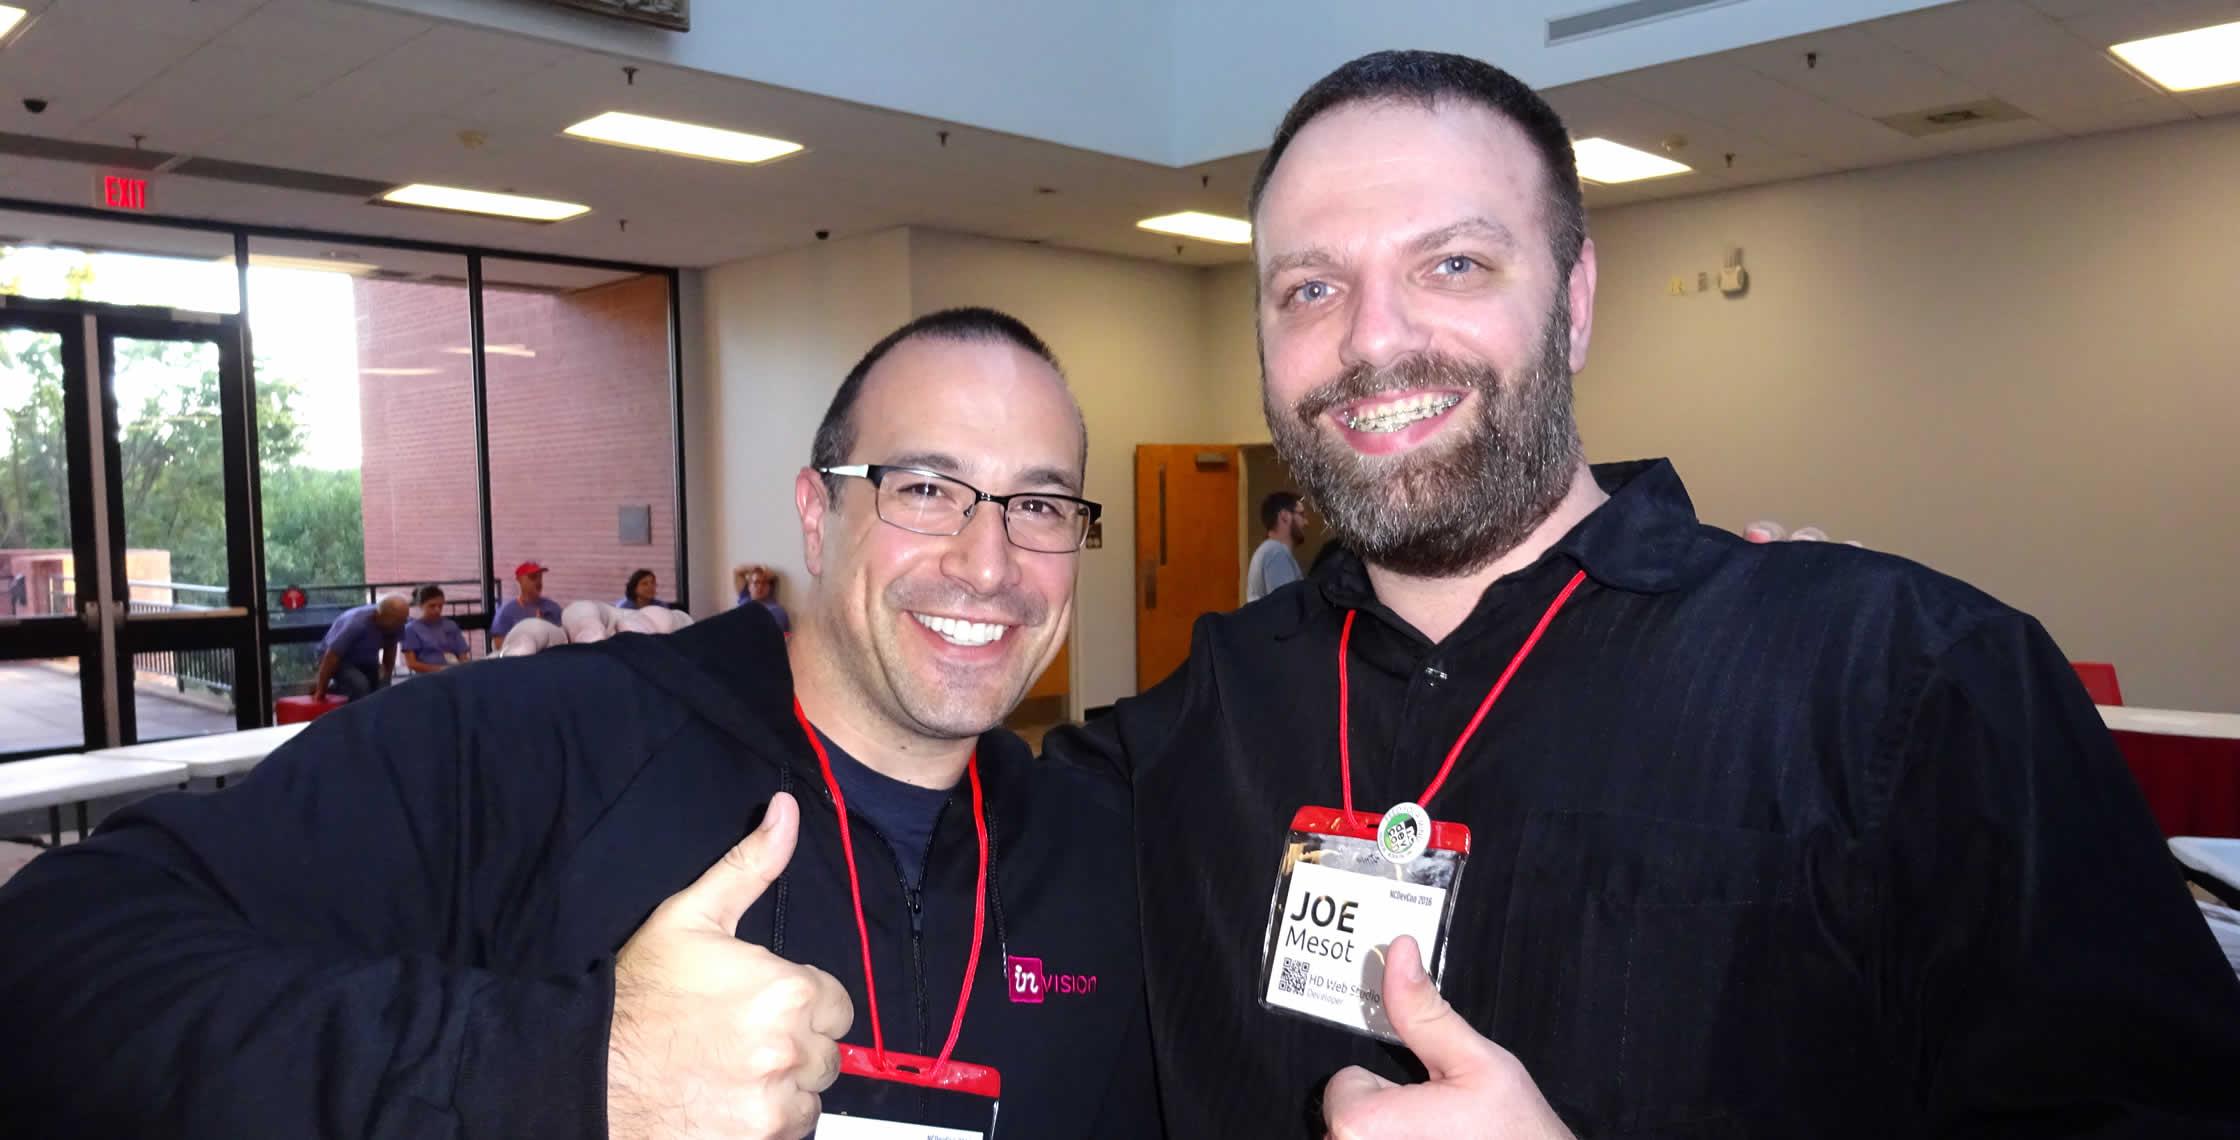 Ben Nadel at NCDevCon 2016 (Raleigh, NC) with: Joe Mesot